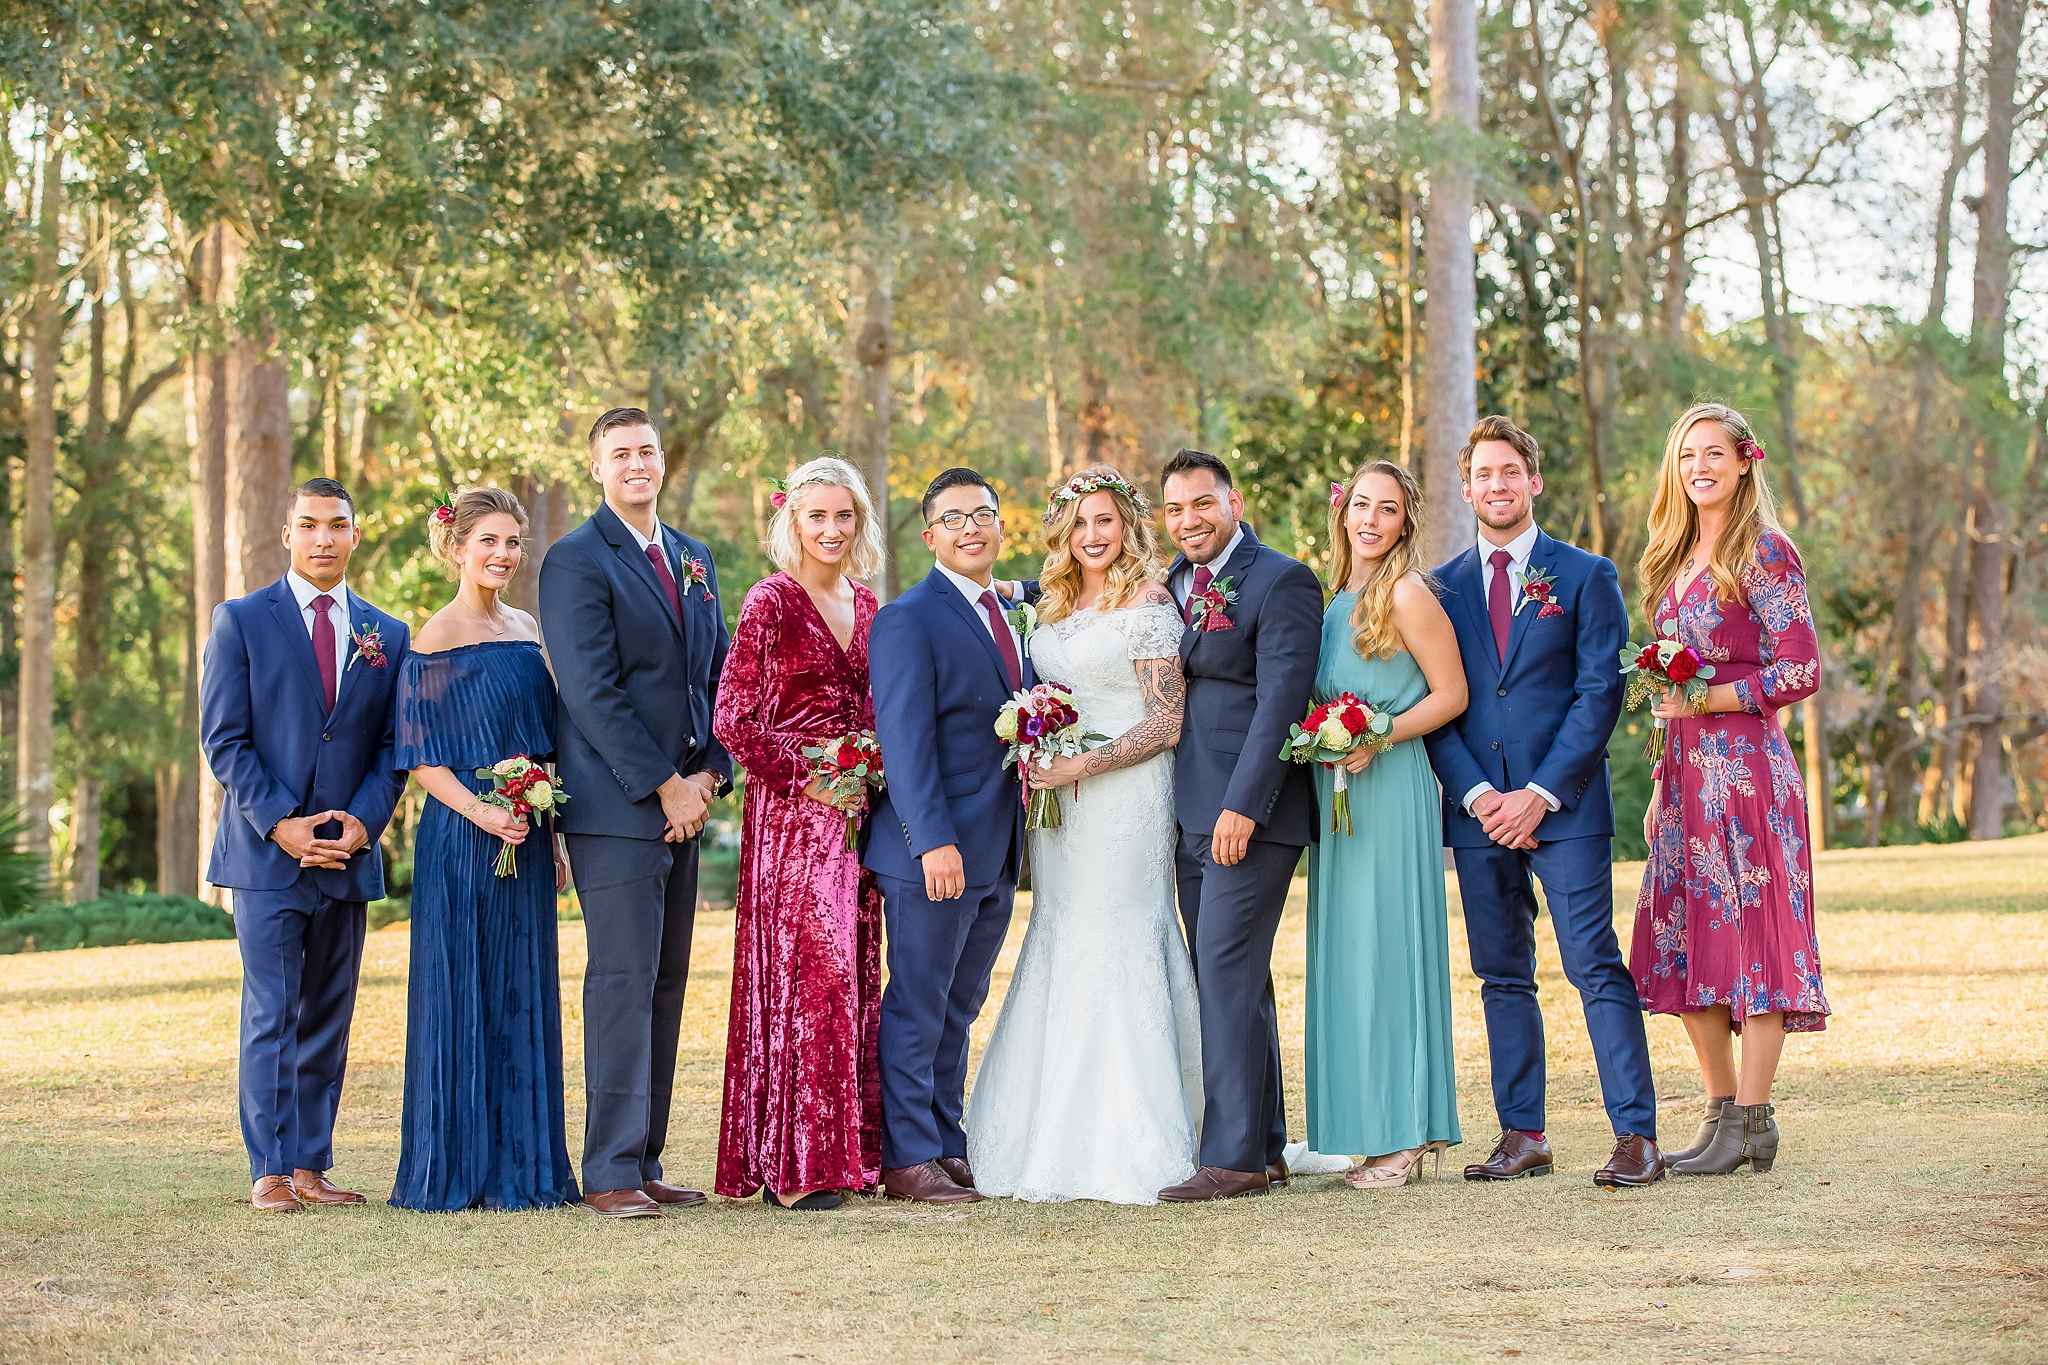 Golden_Eagle_Wedding_Tallahassee-52.jpg